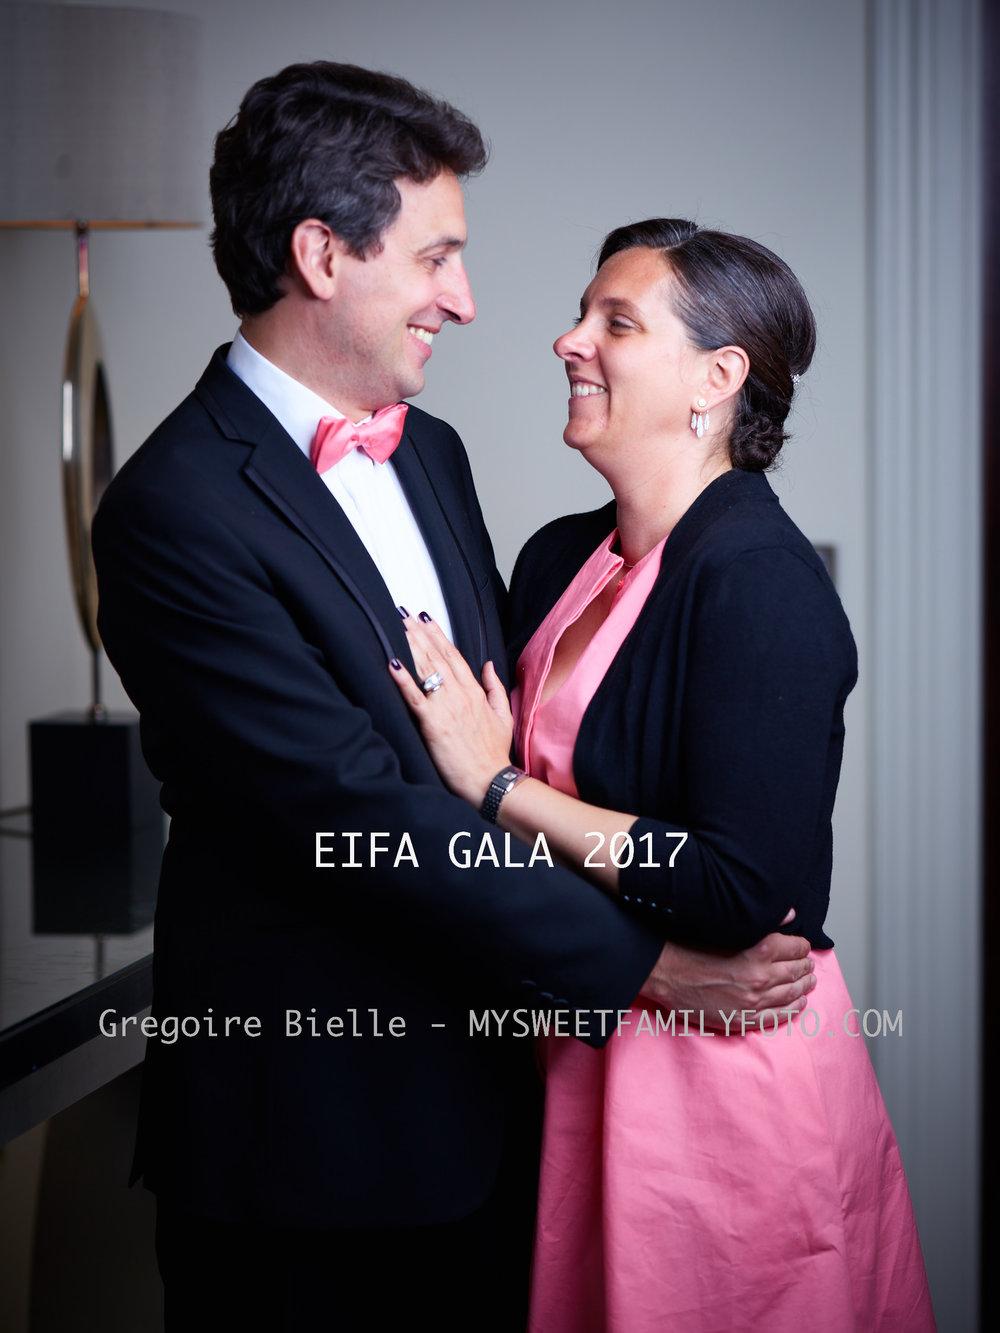 EIFA GALA 1203.jpg